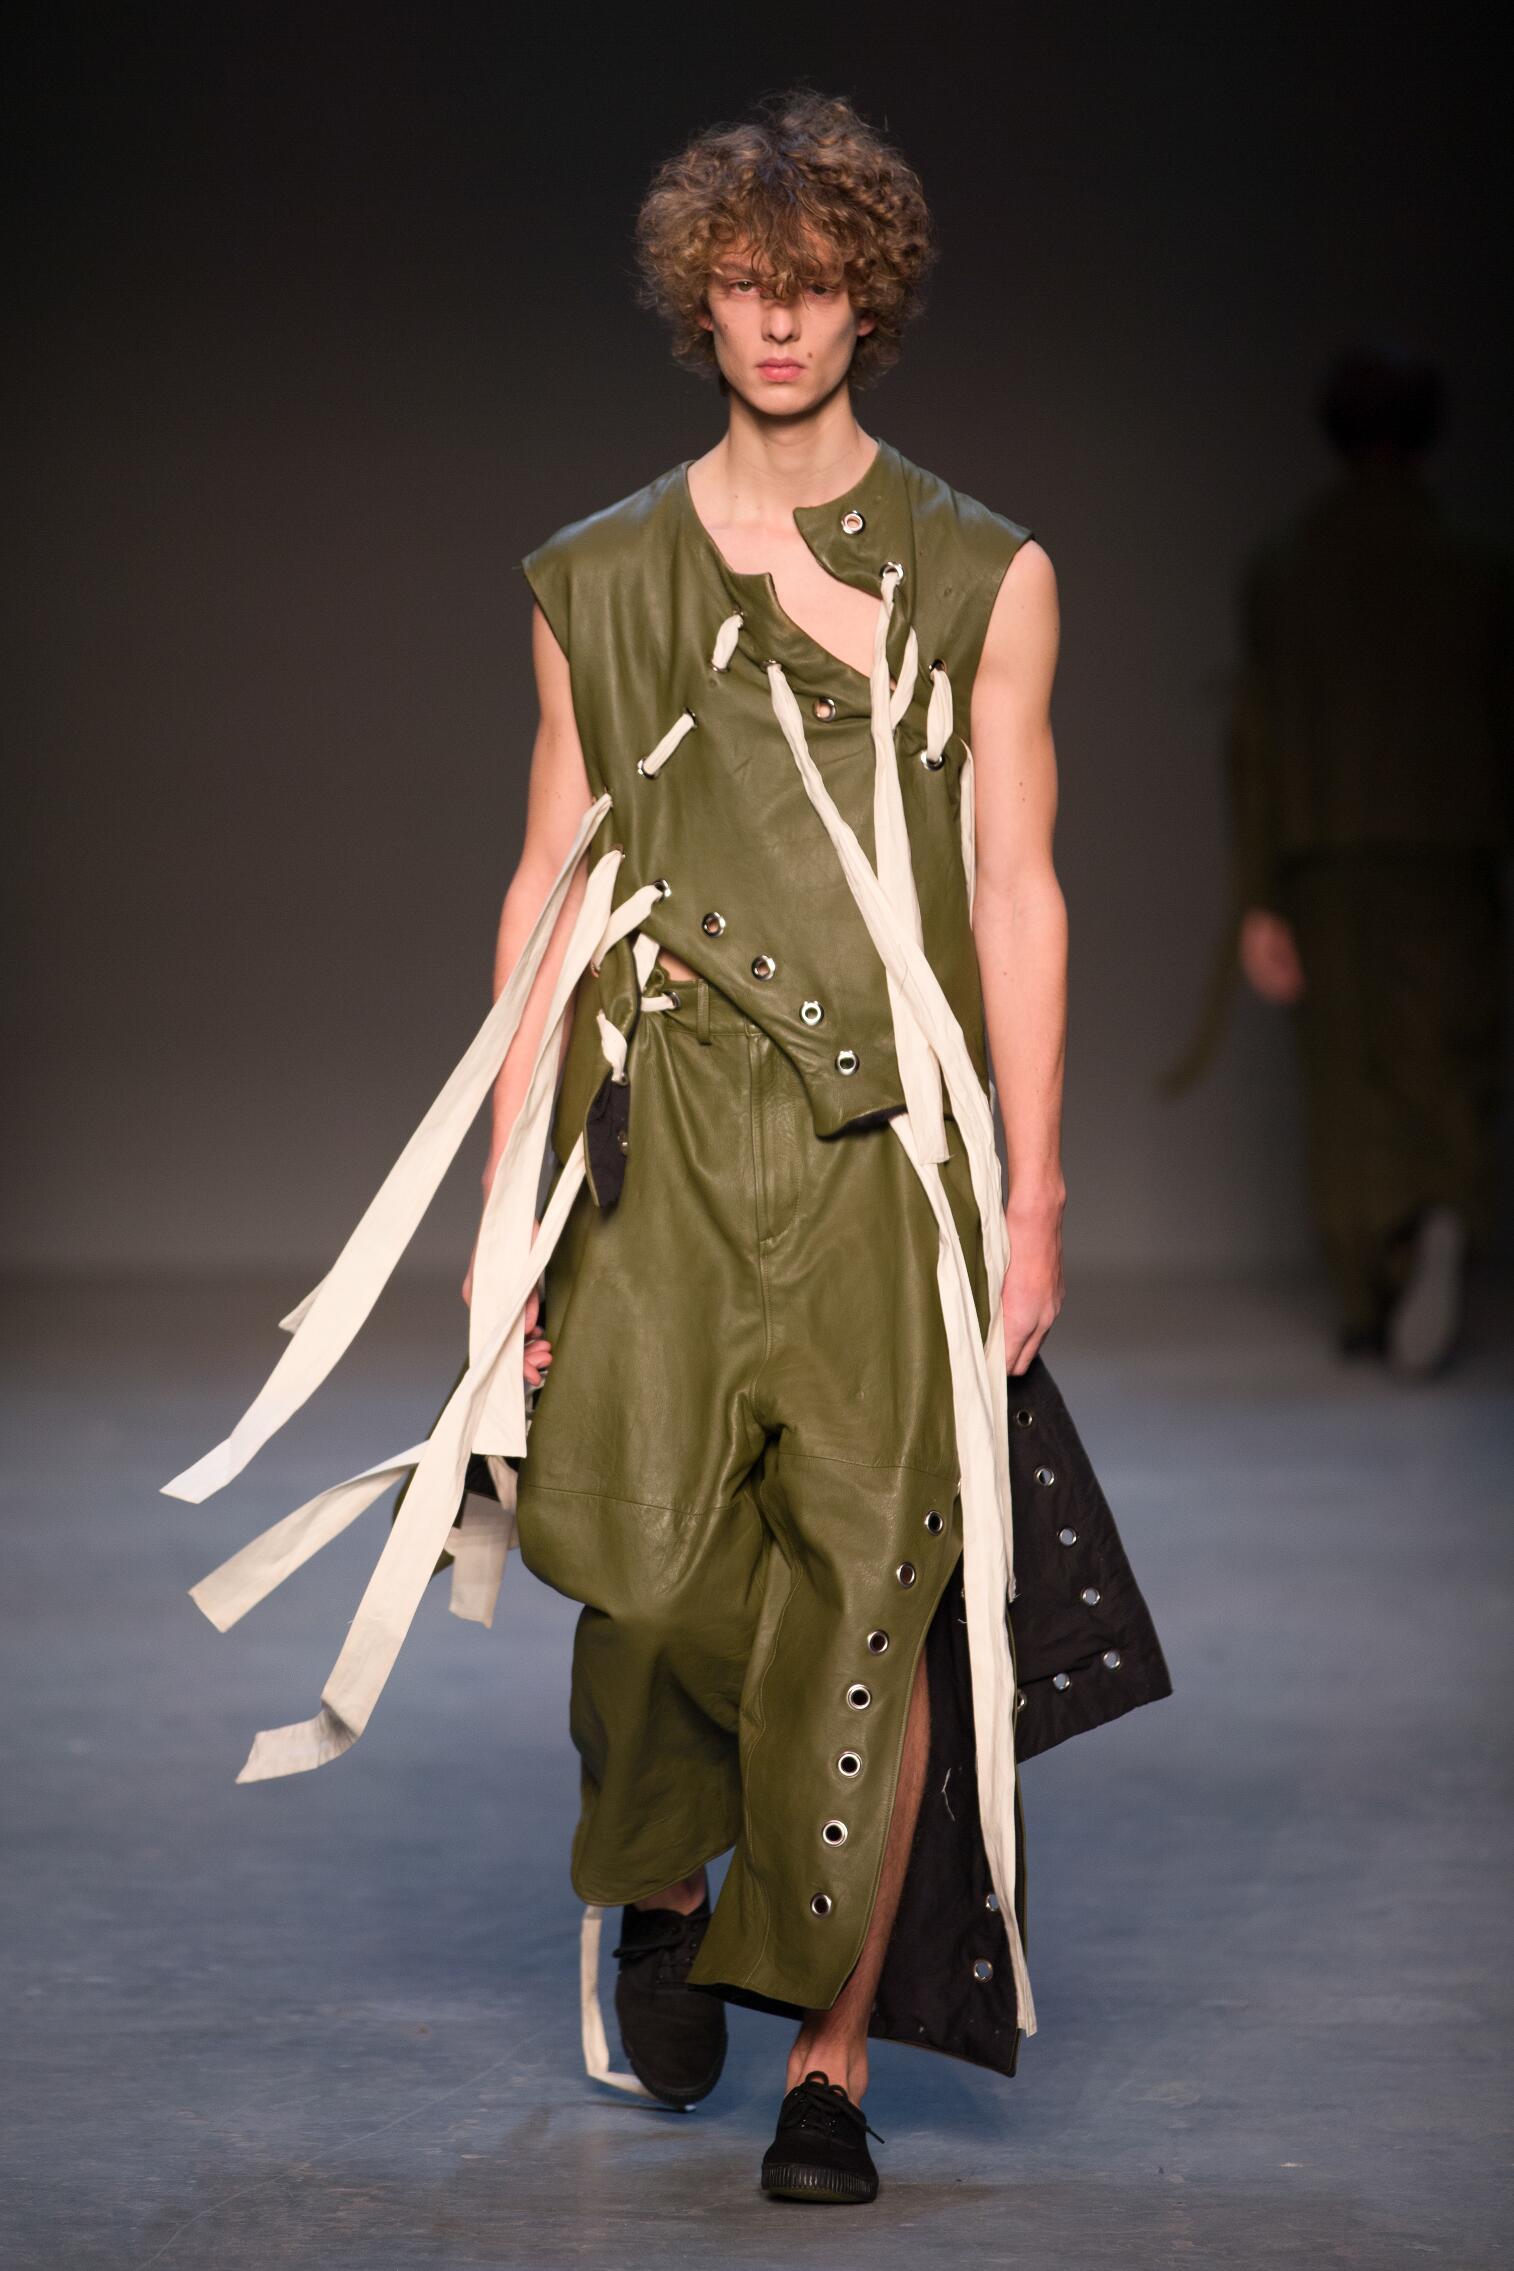 Craig Green London Fashion Week